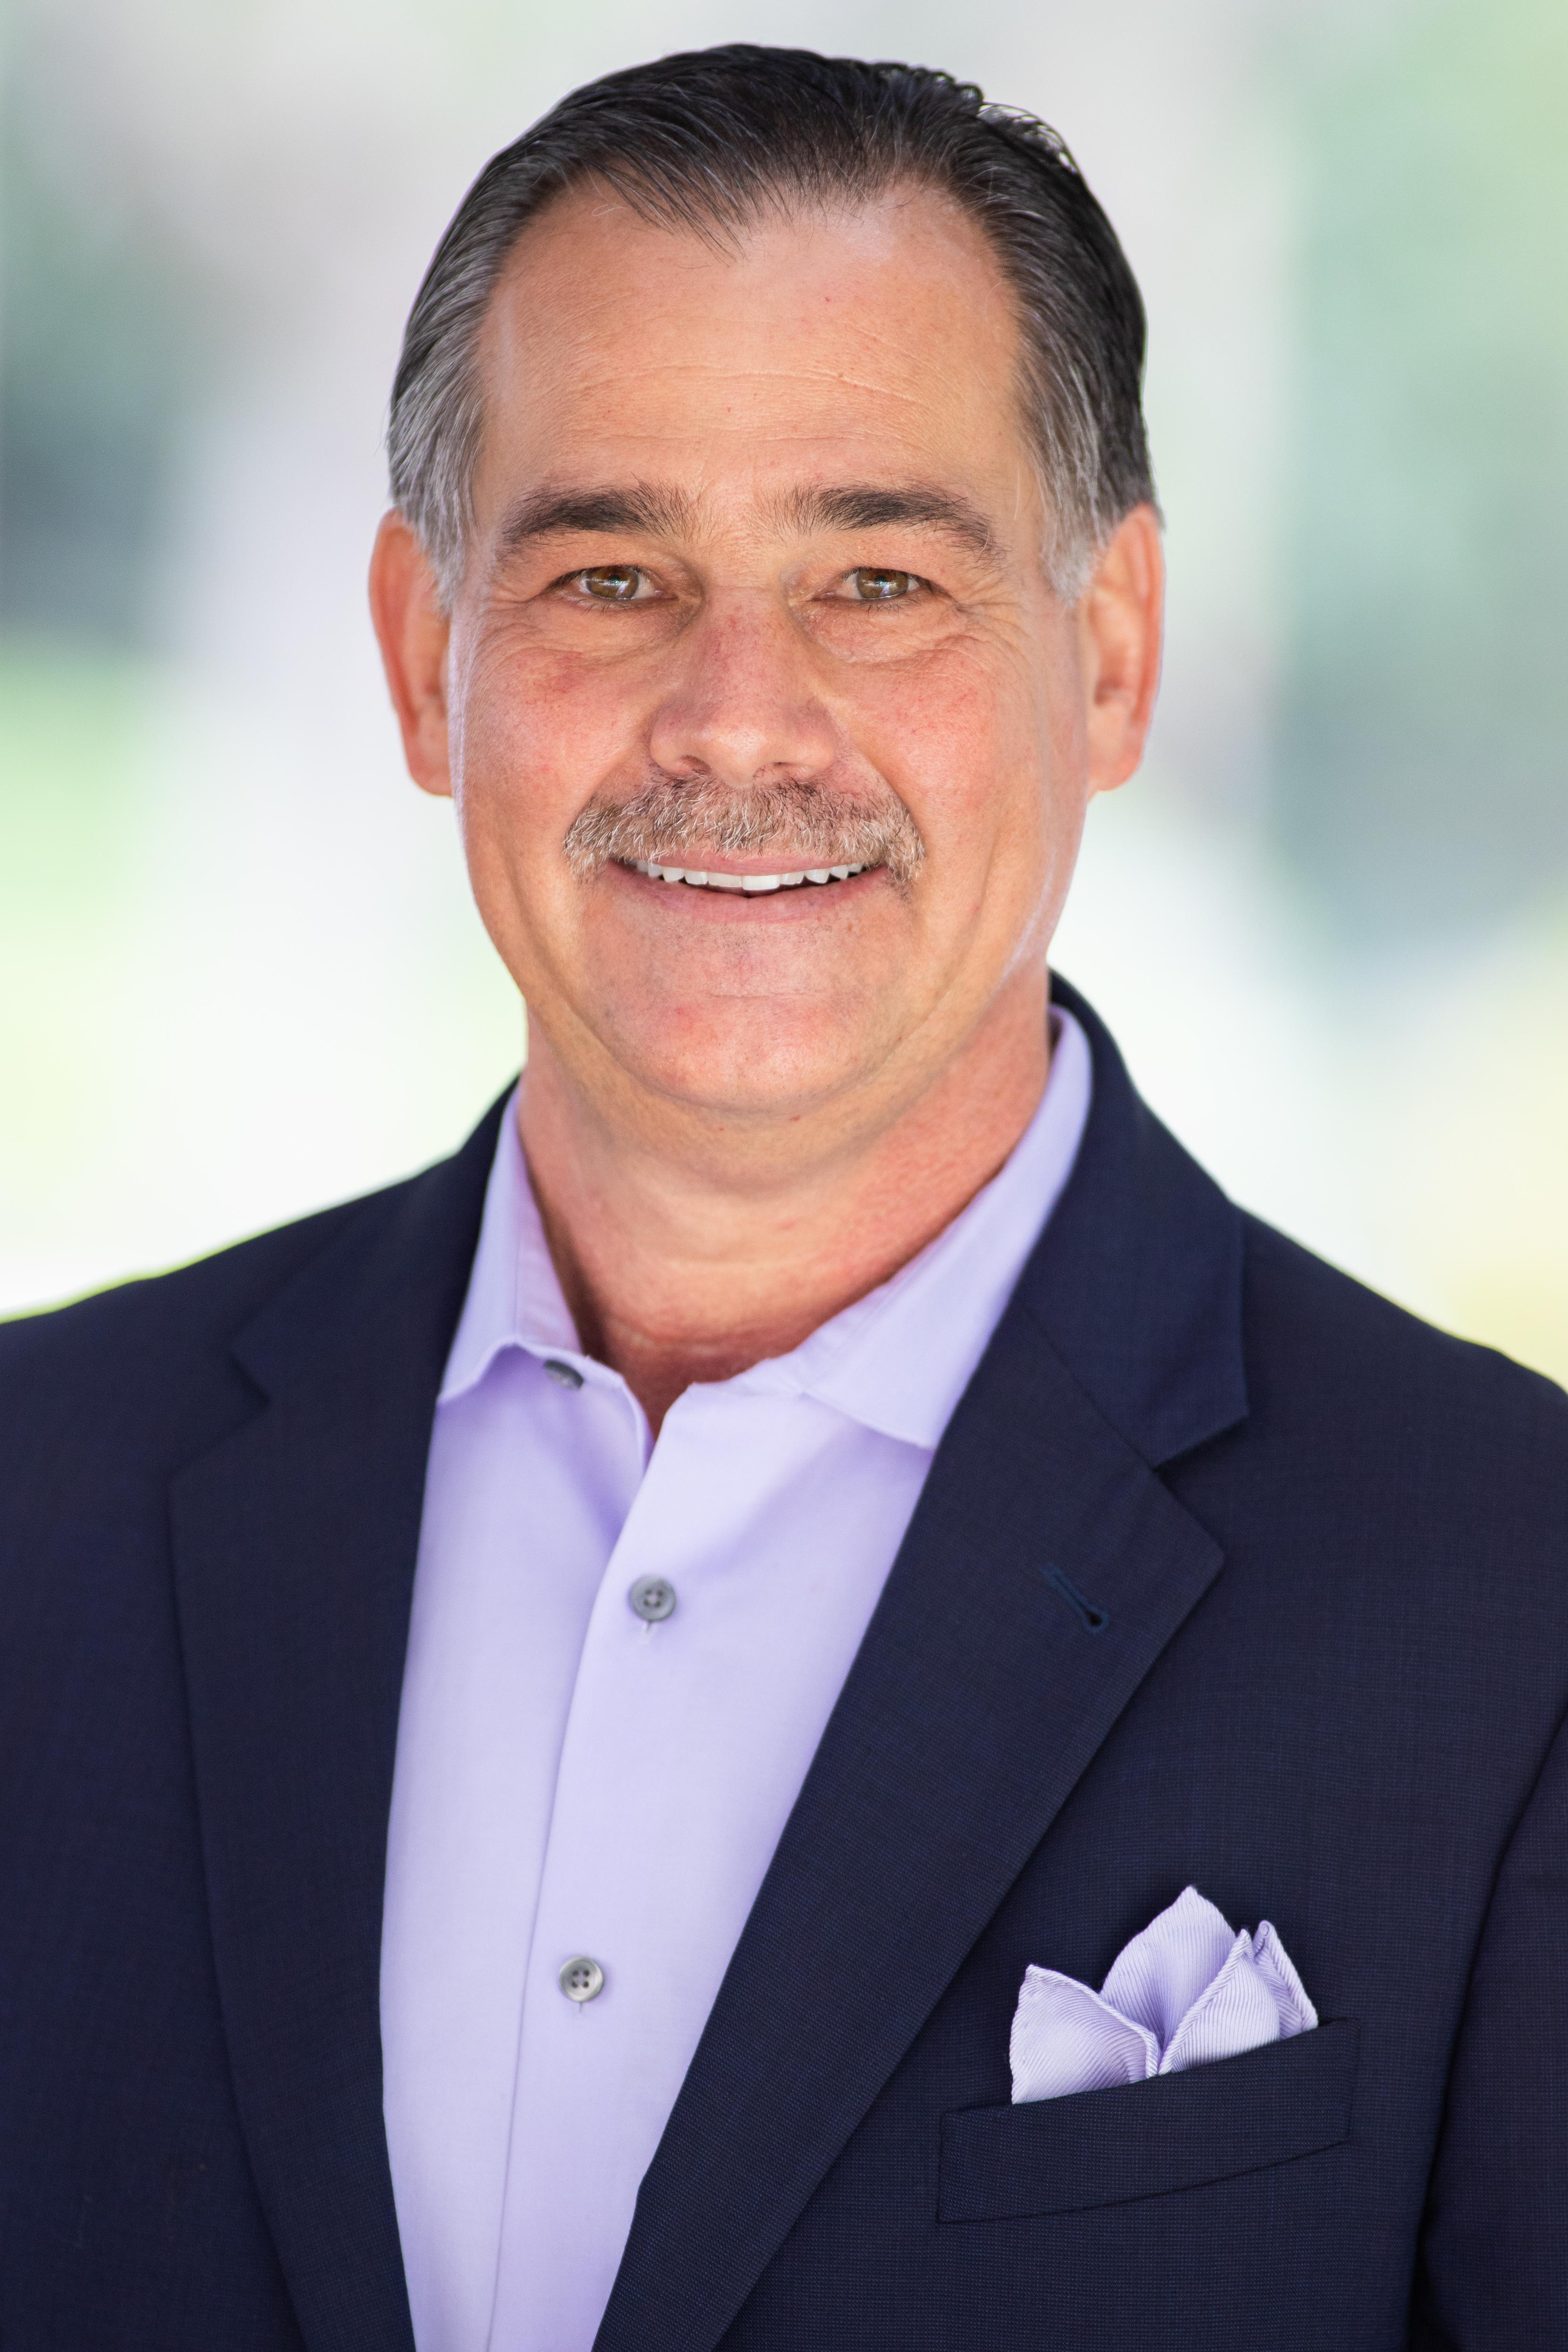 Gregg Cantor's photo - President & CEO of Murray Lampert DBR